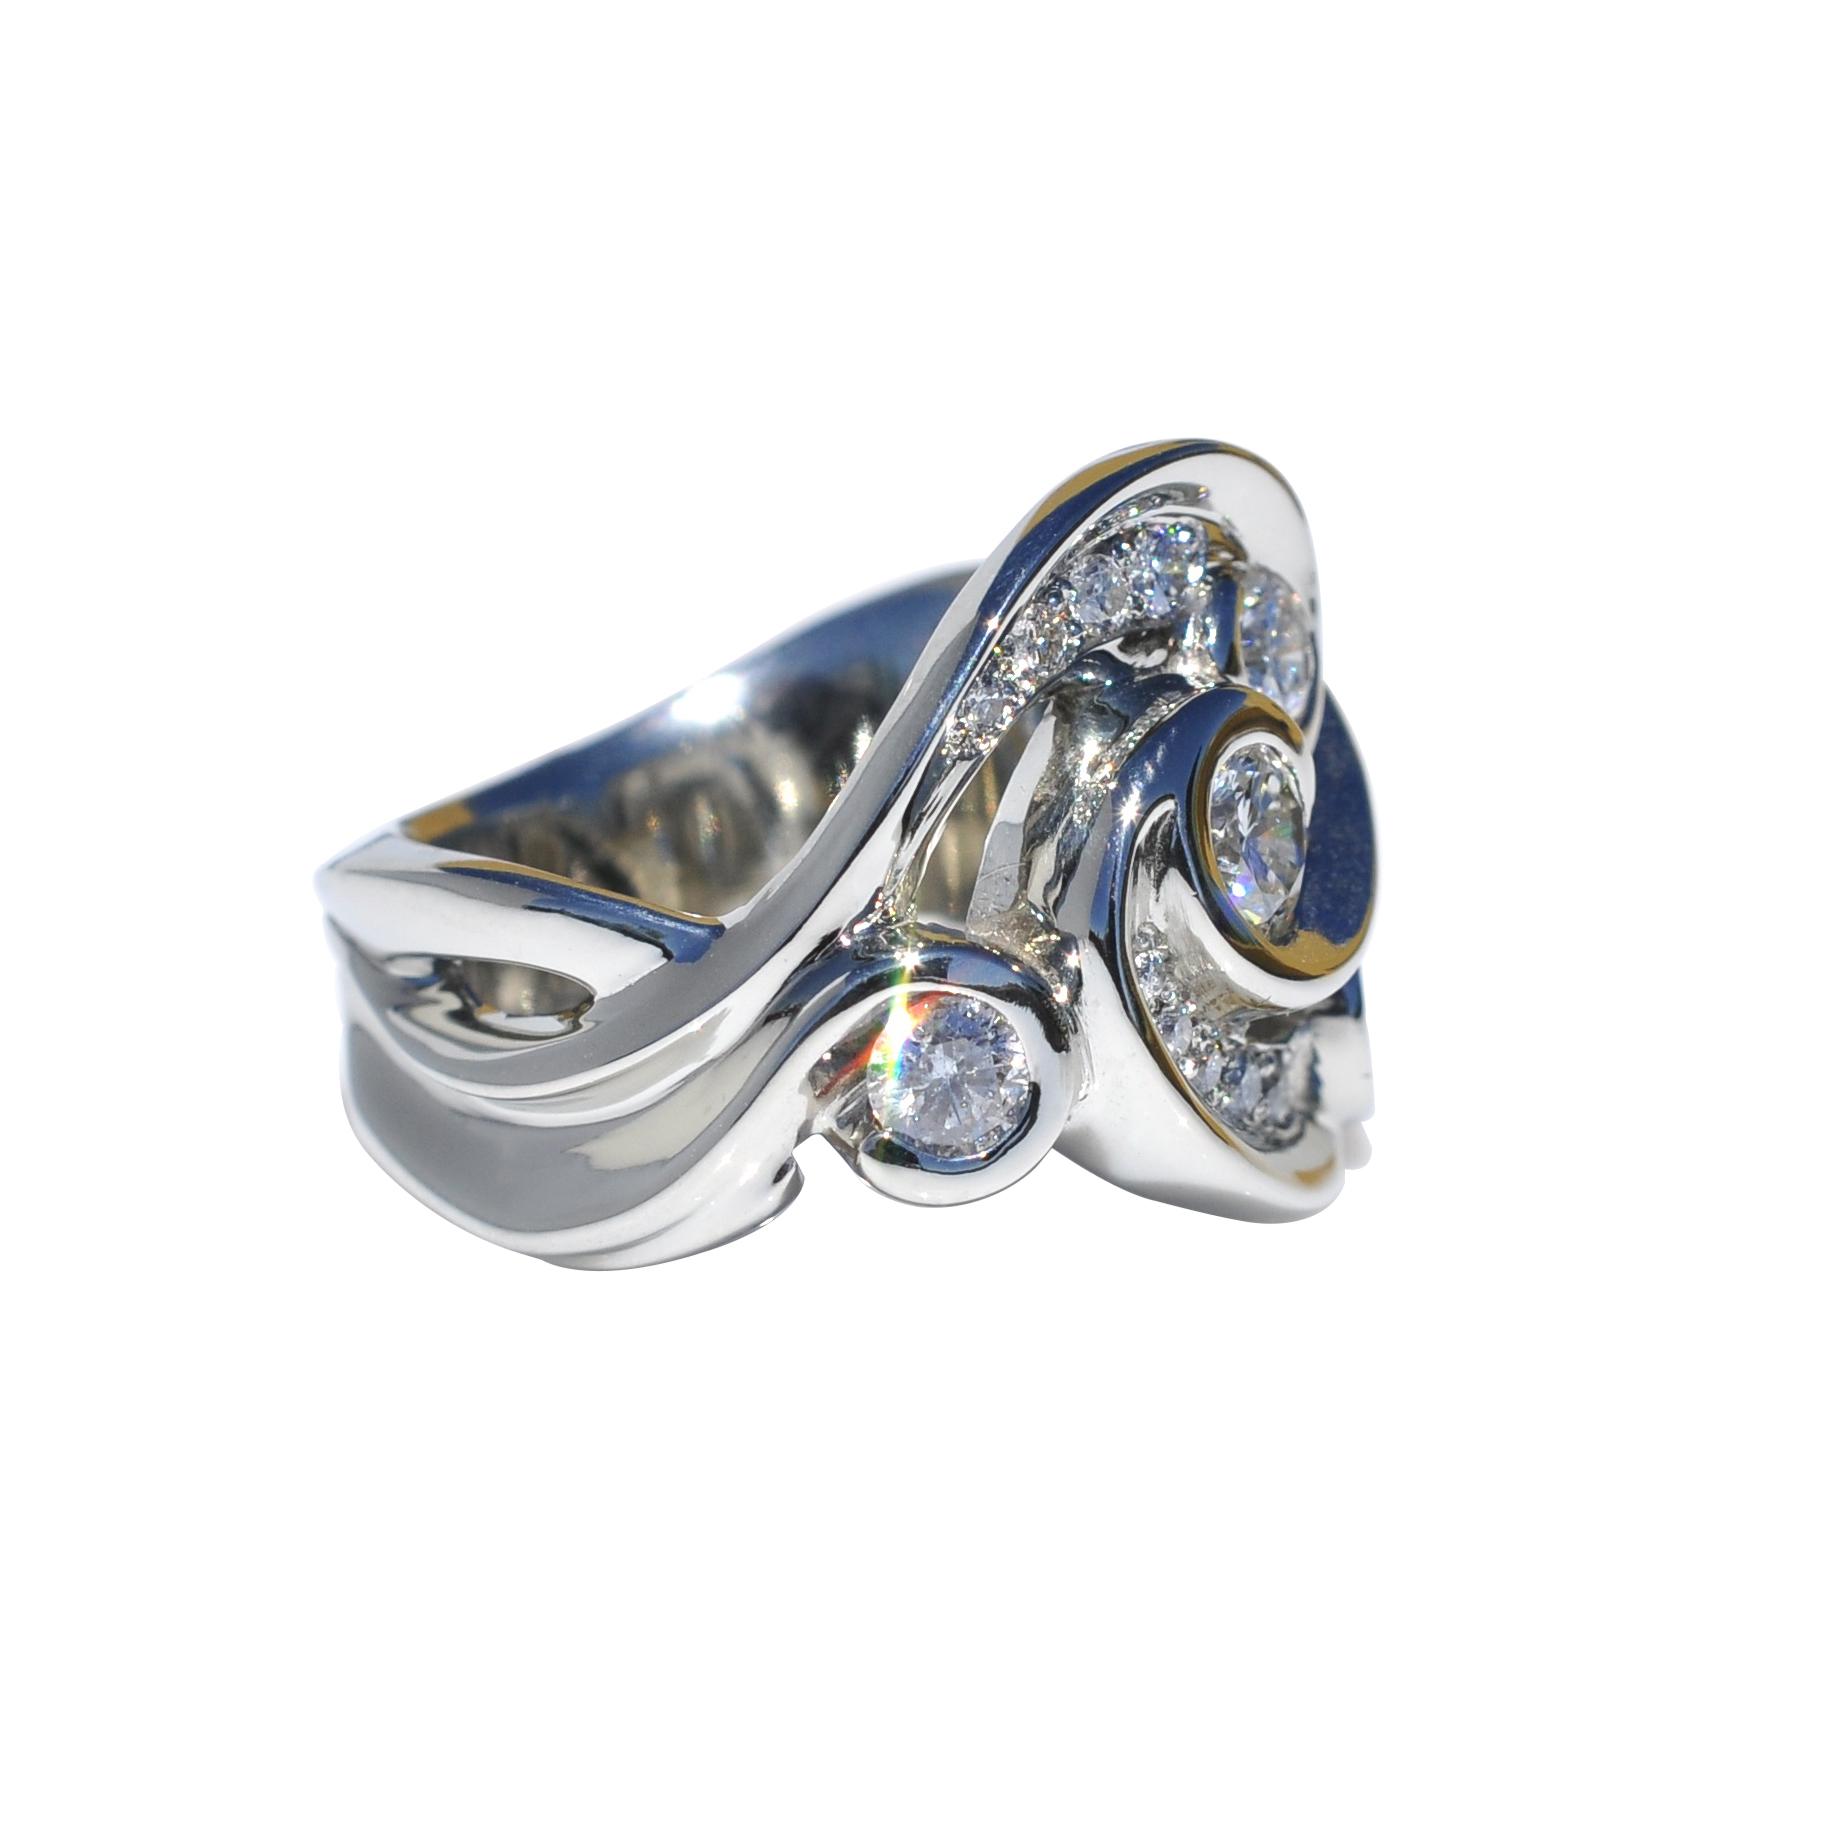 14k White Gold Waylon Rhoads Original Custom Ring Extravaganza with Diamonds